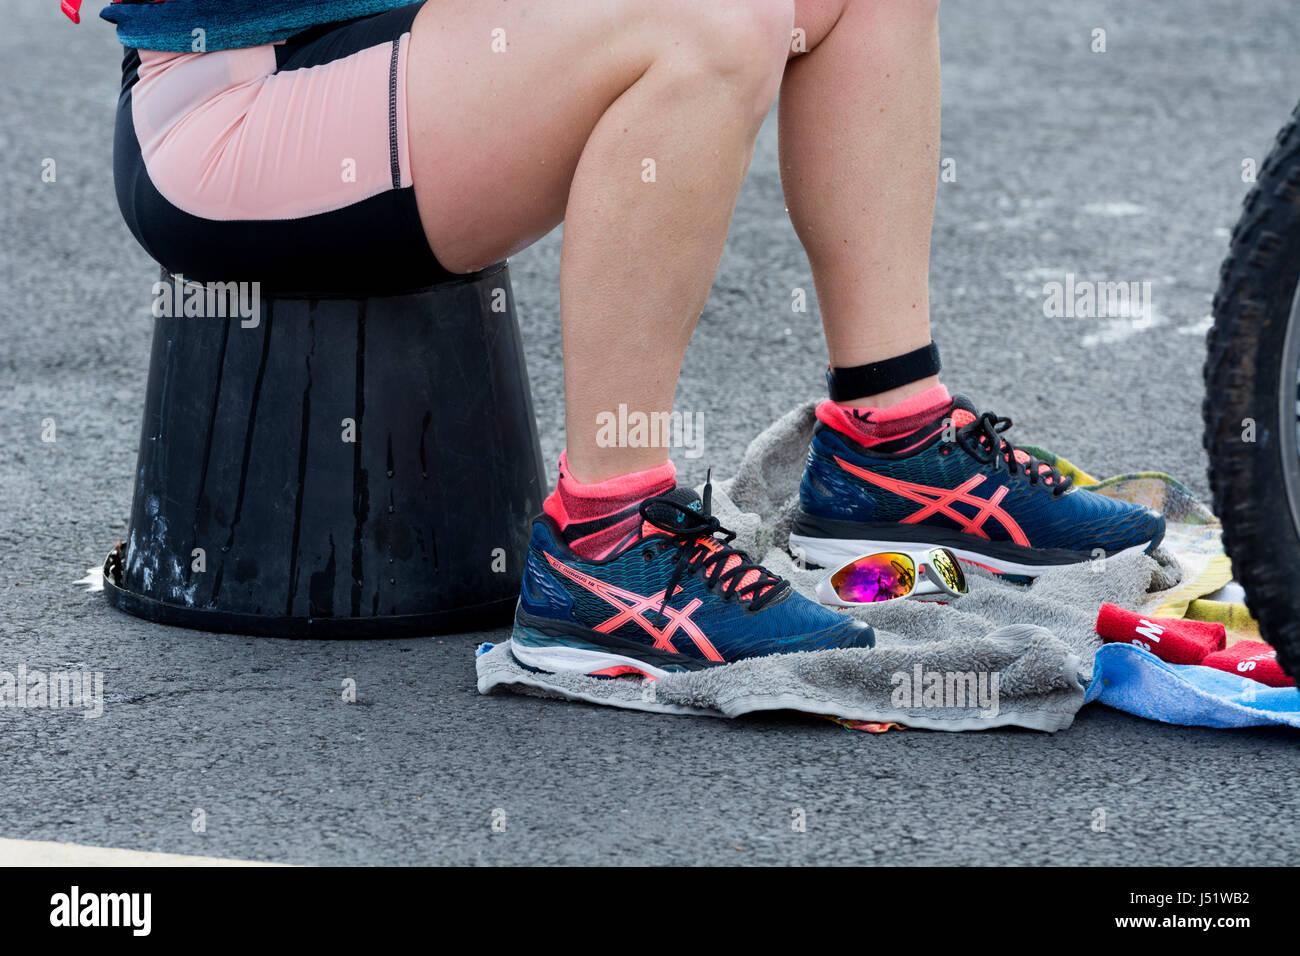 Scarpe Di AsicsArea Da Concorrente Femmina Corsa Indossando rhtsdxQC